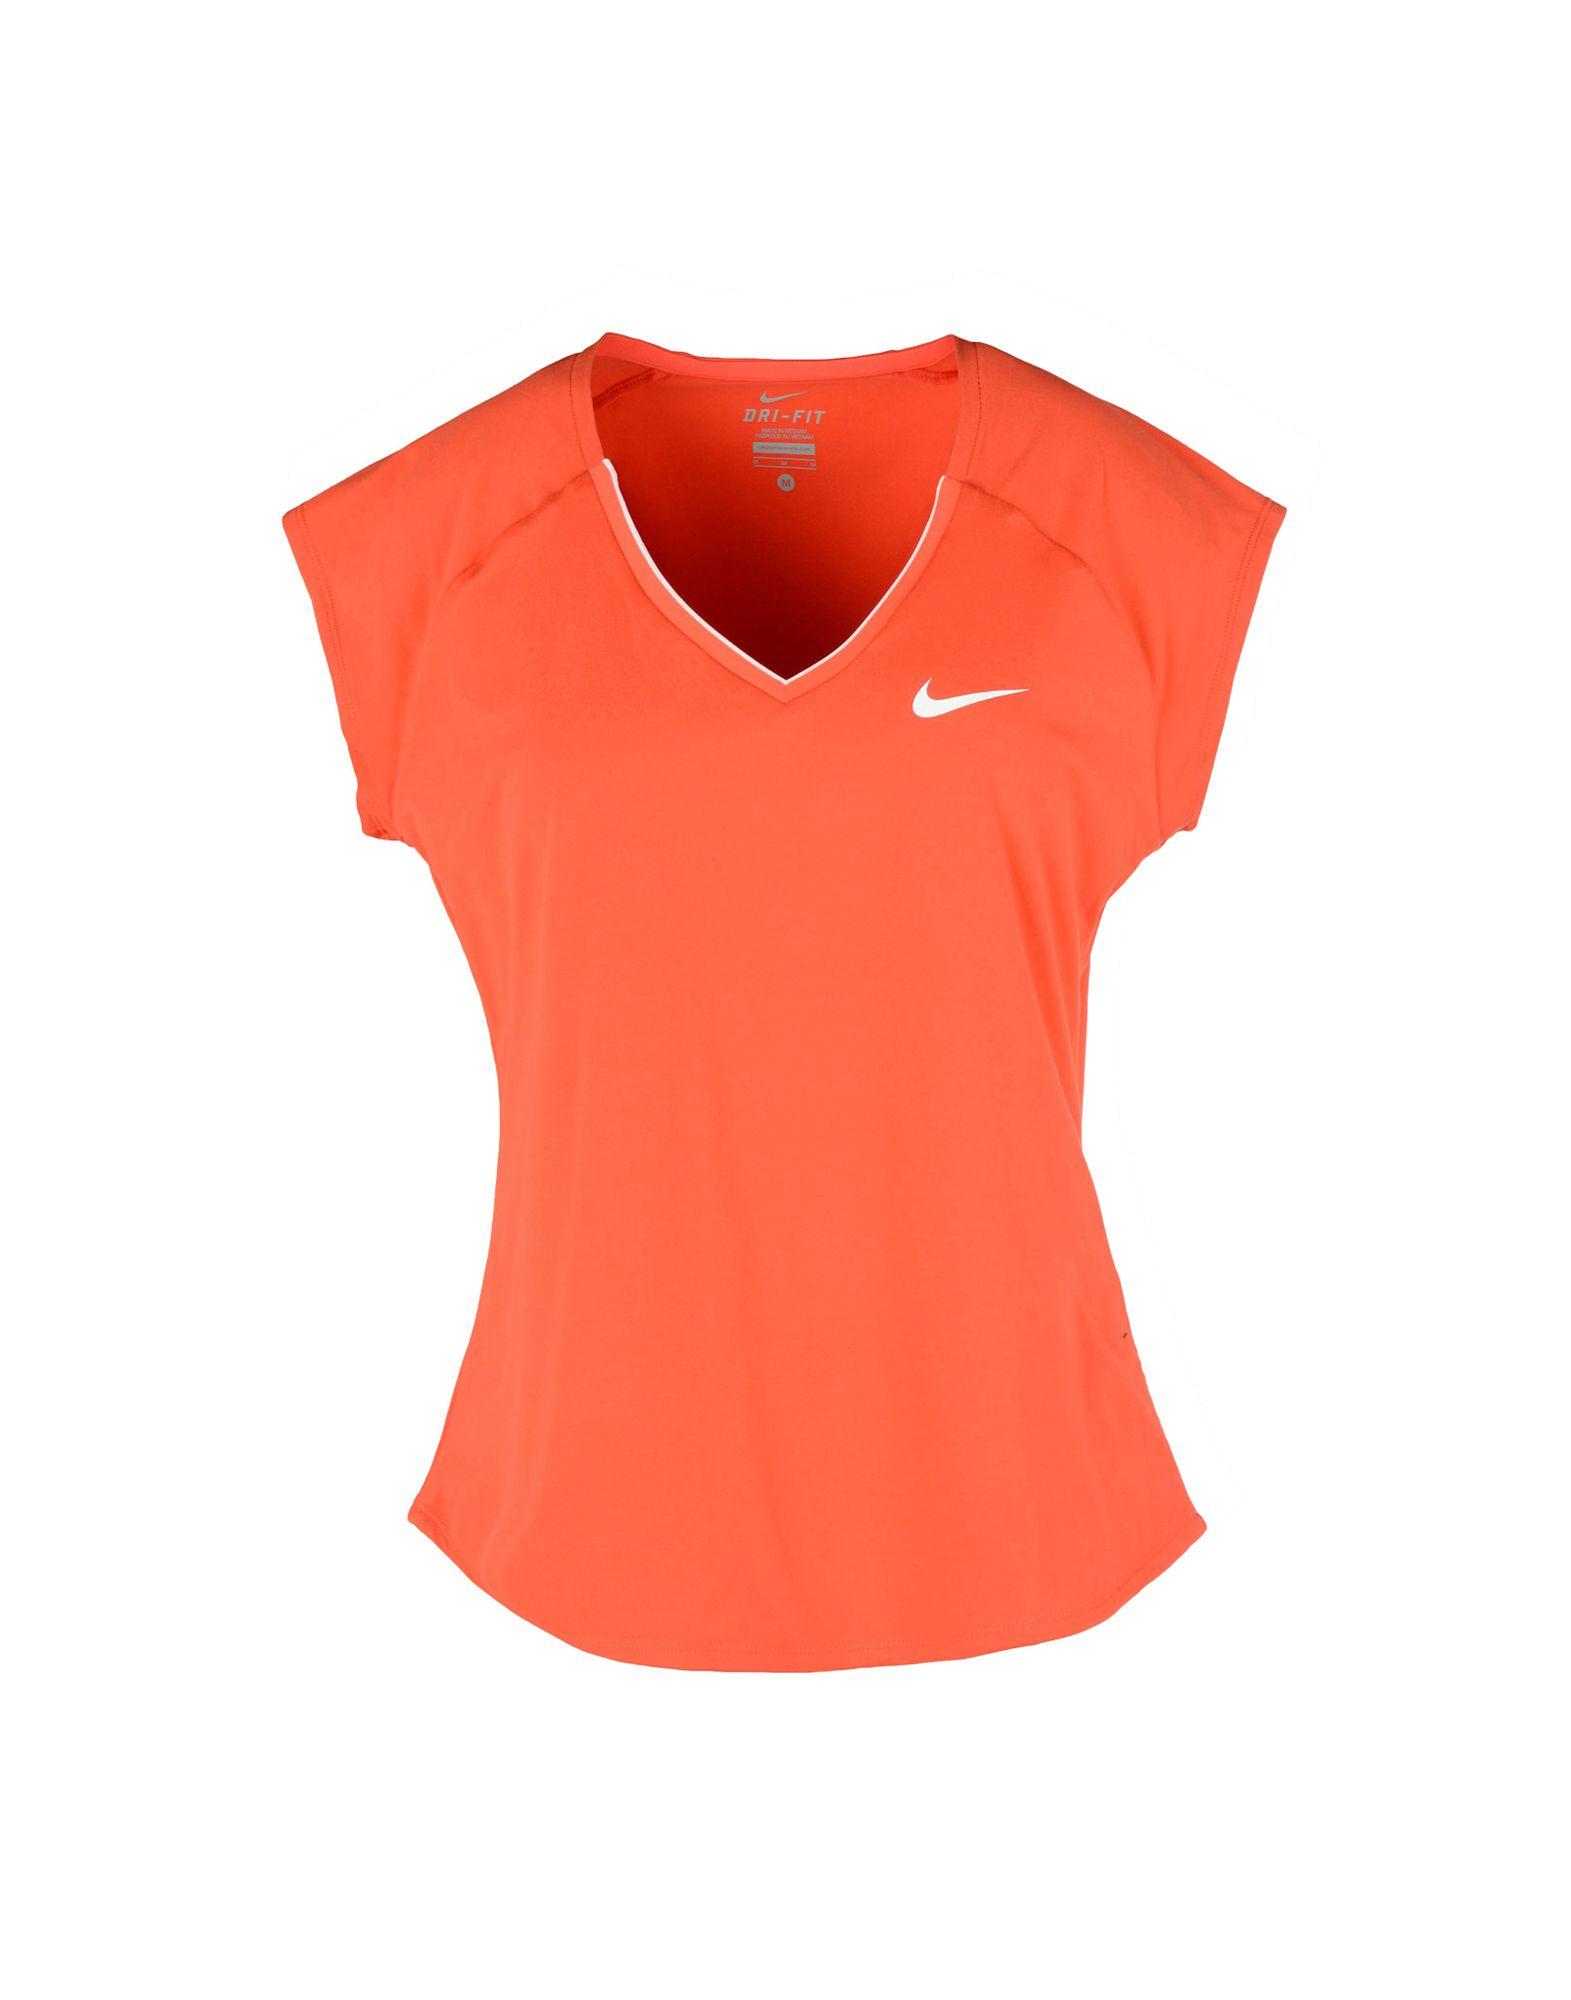 NIKE Damen T-shirts Farbe Rot Größe 6